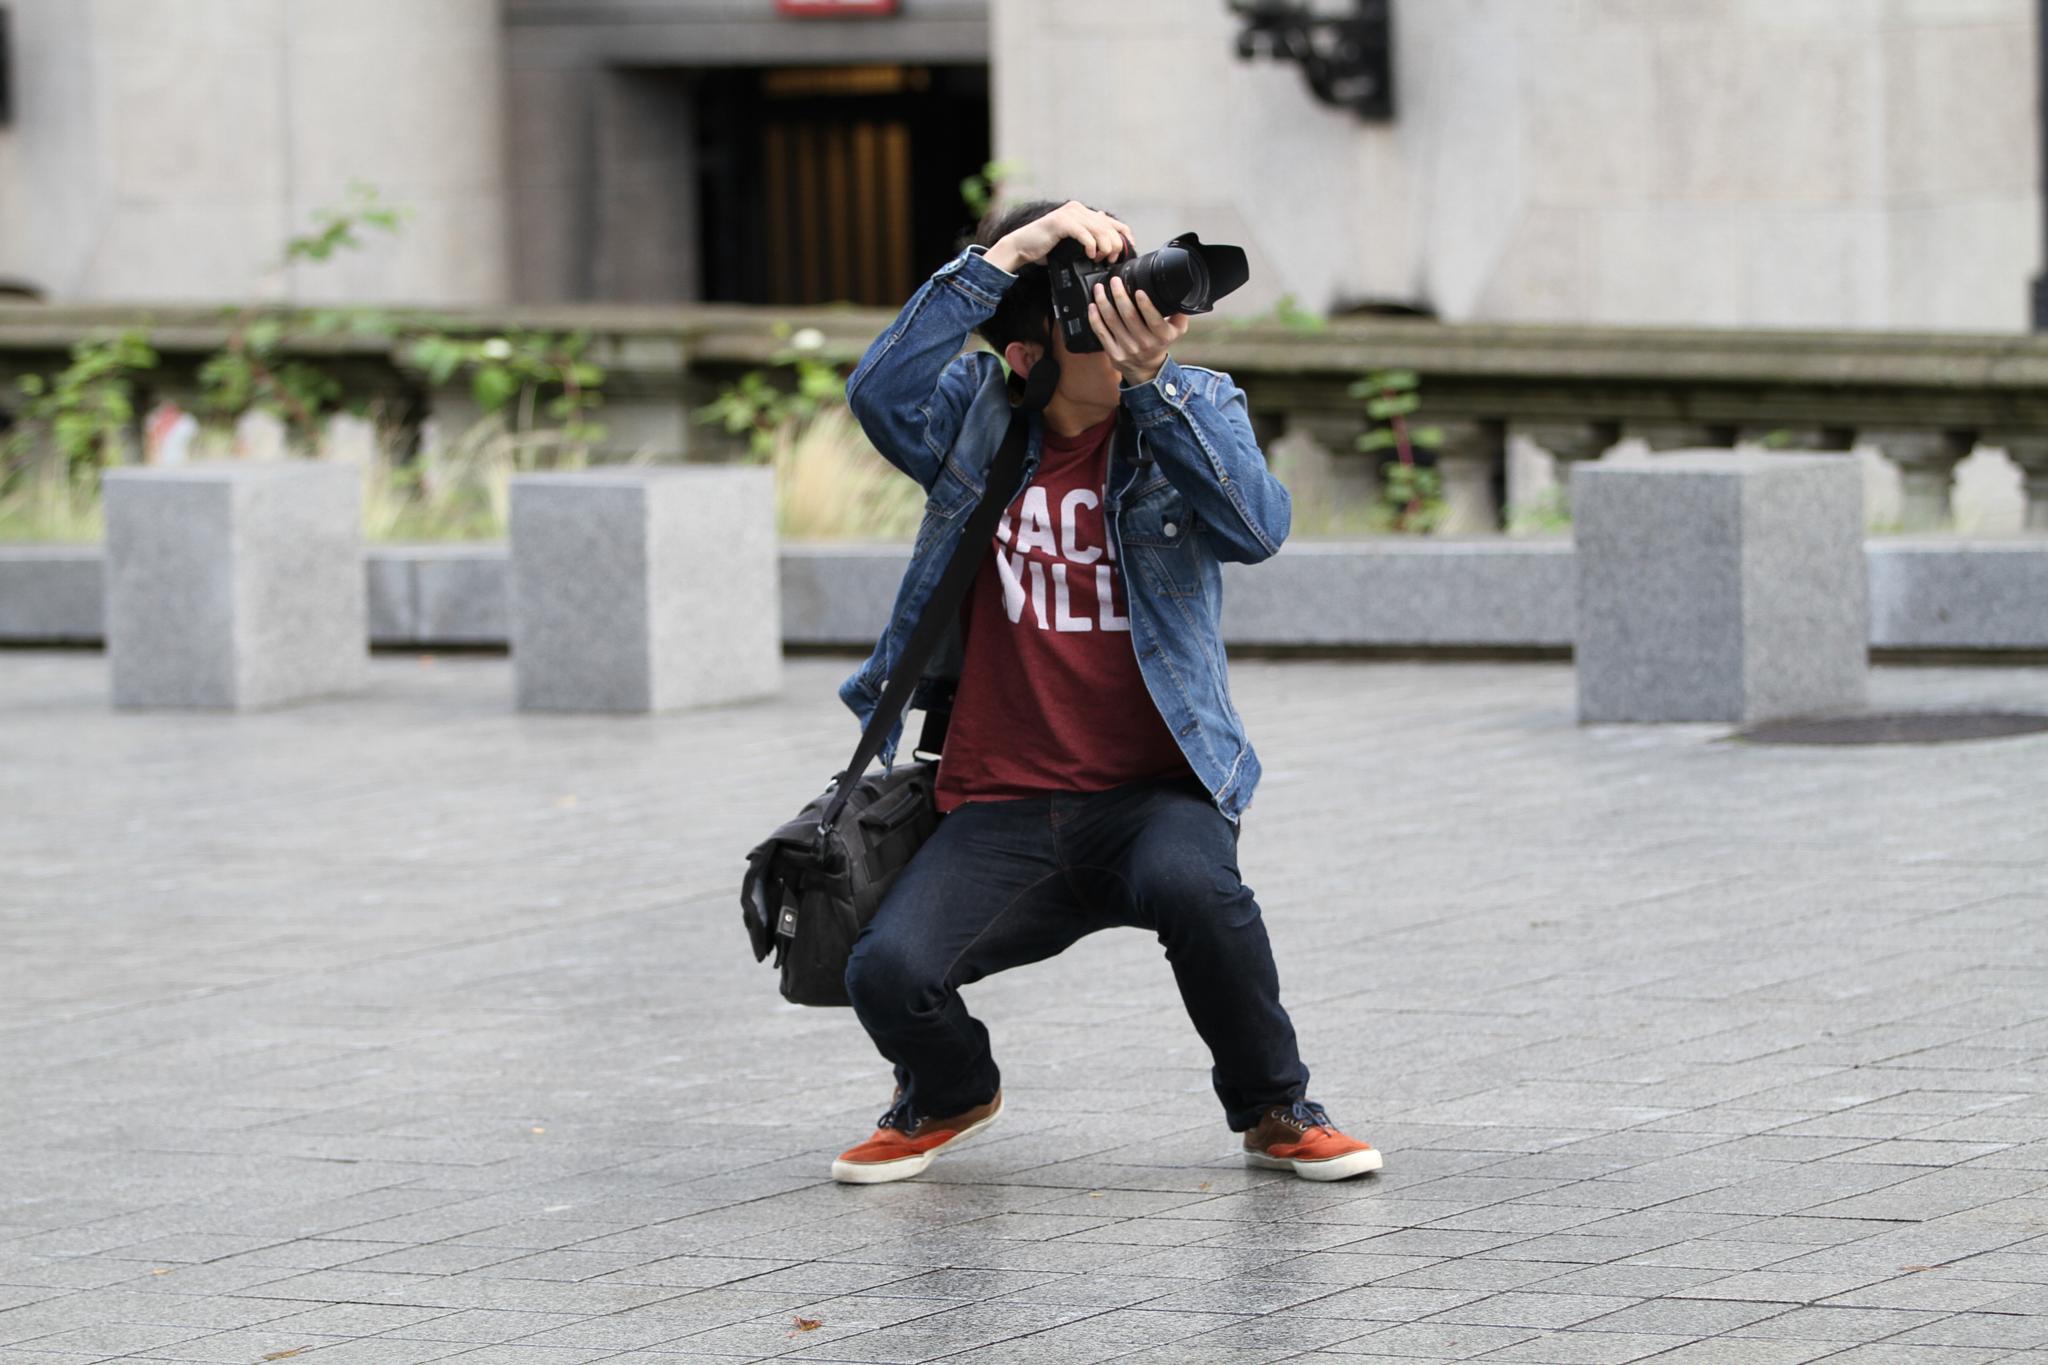 Street Photography by Alan Travis